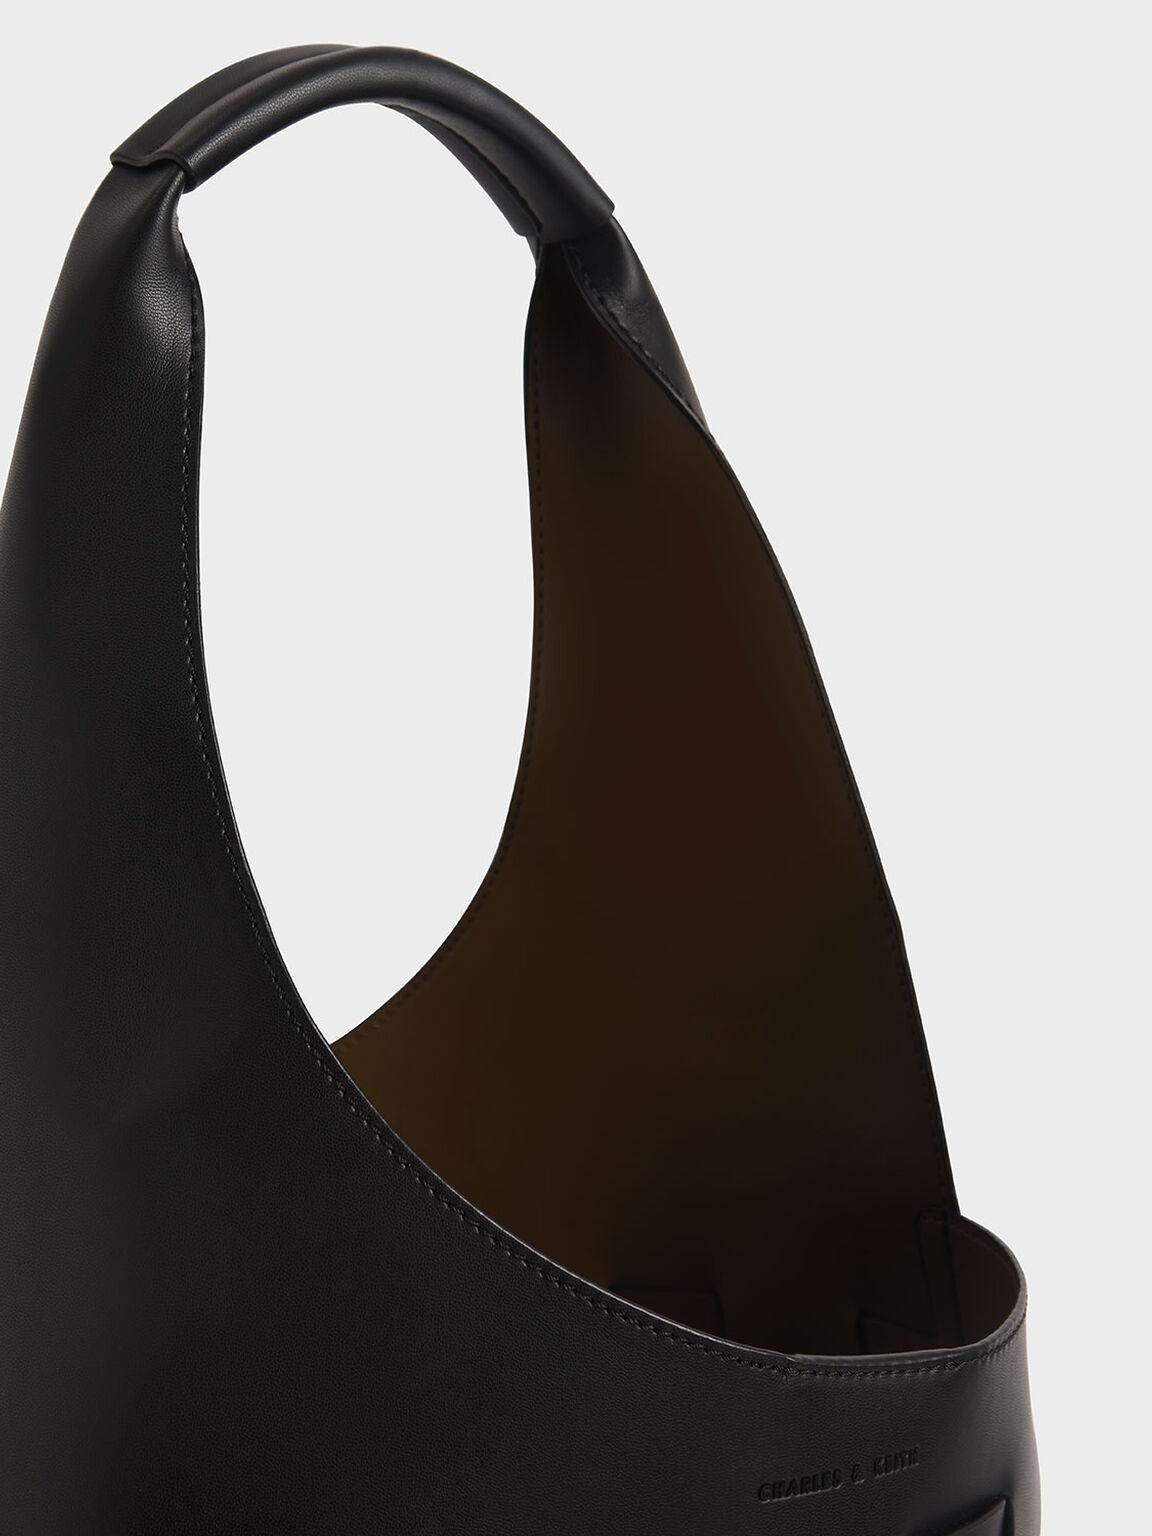 Woven Shoulder Bag, Black, hi-res